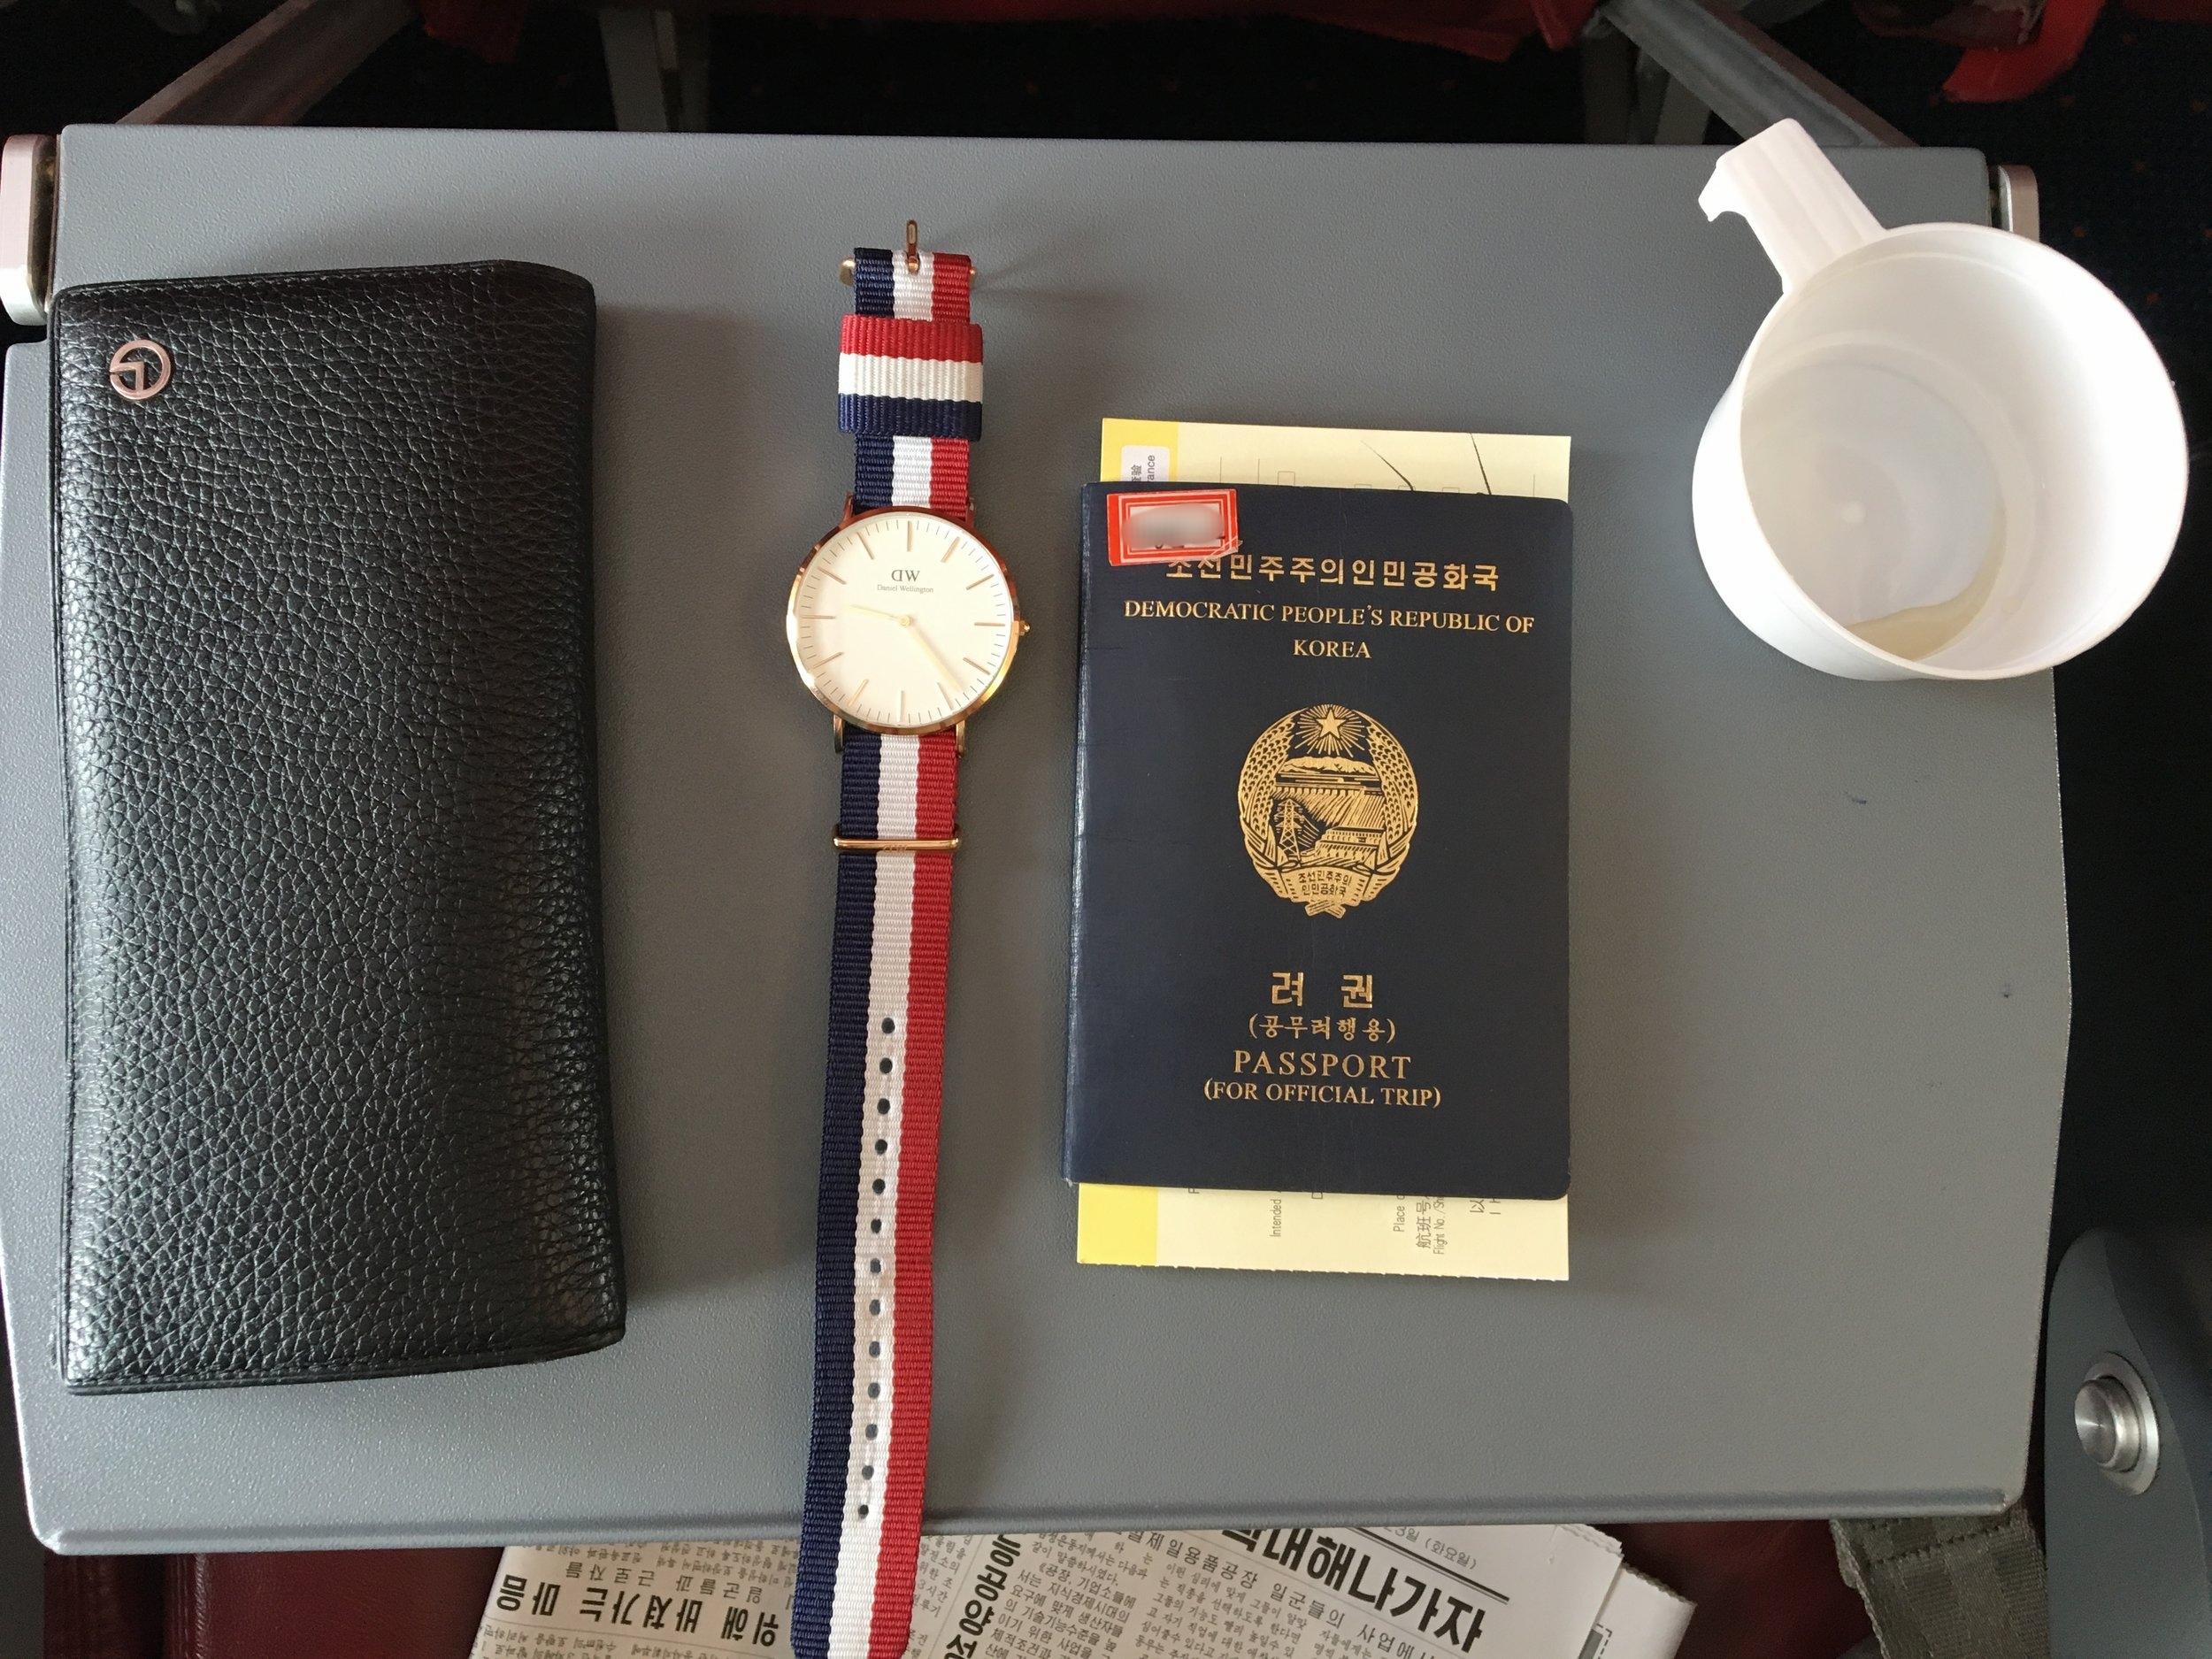 A North Korean student's Daniel Wellington watch and passport